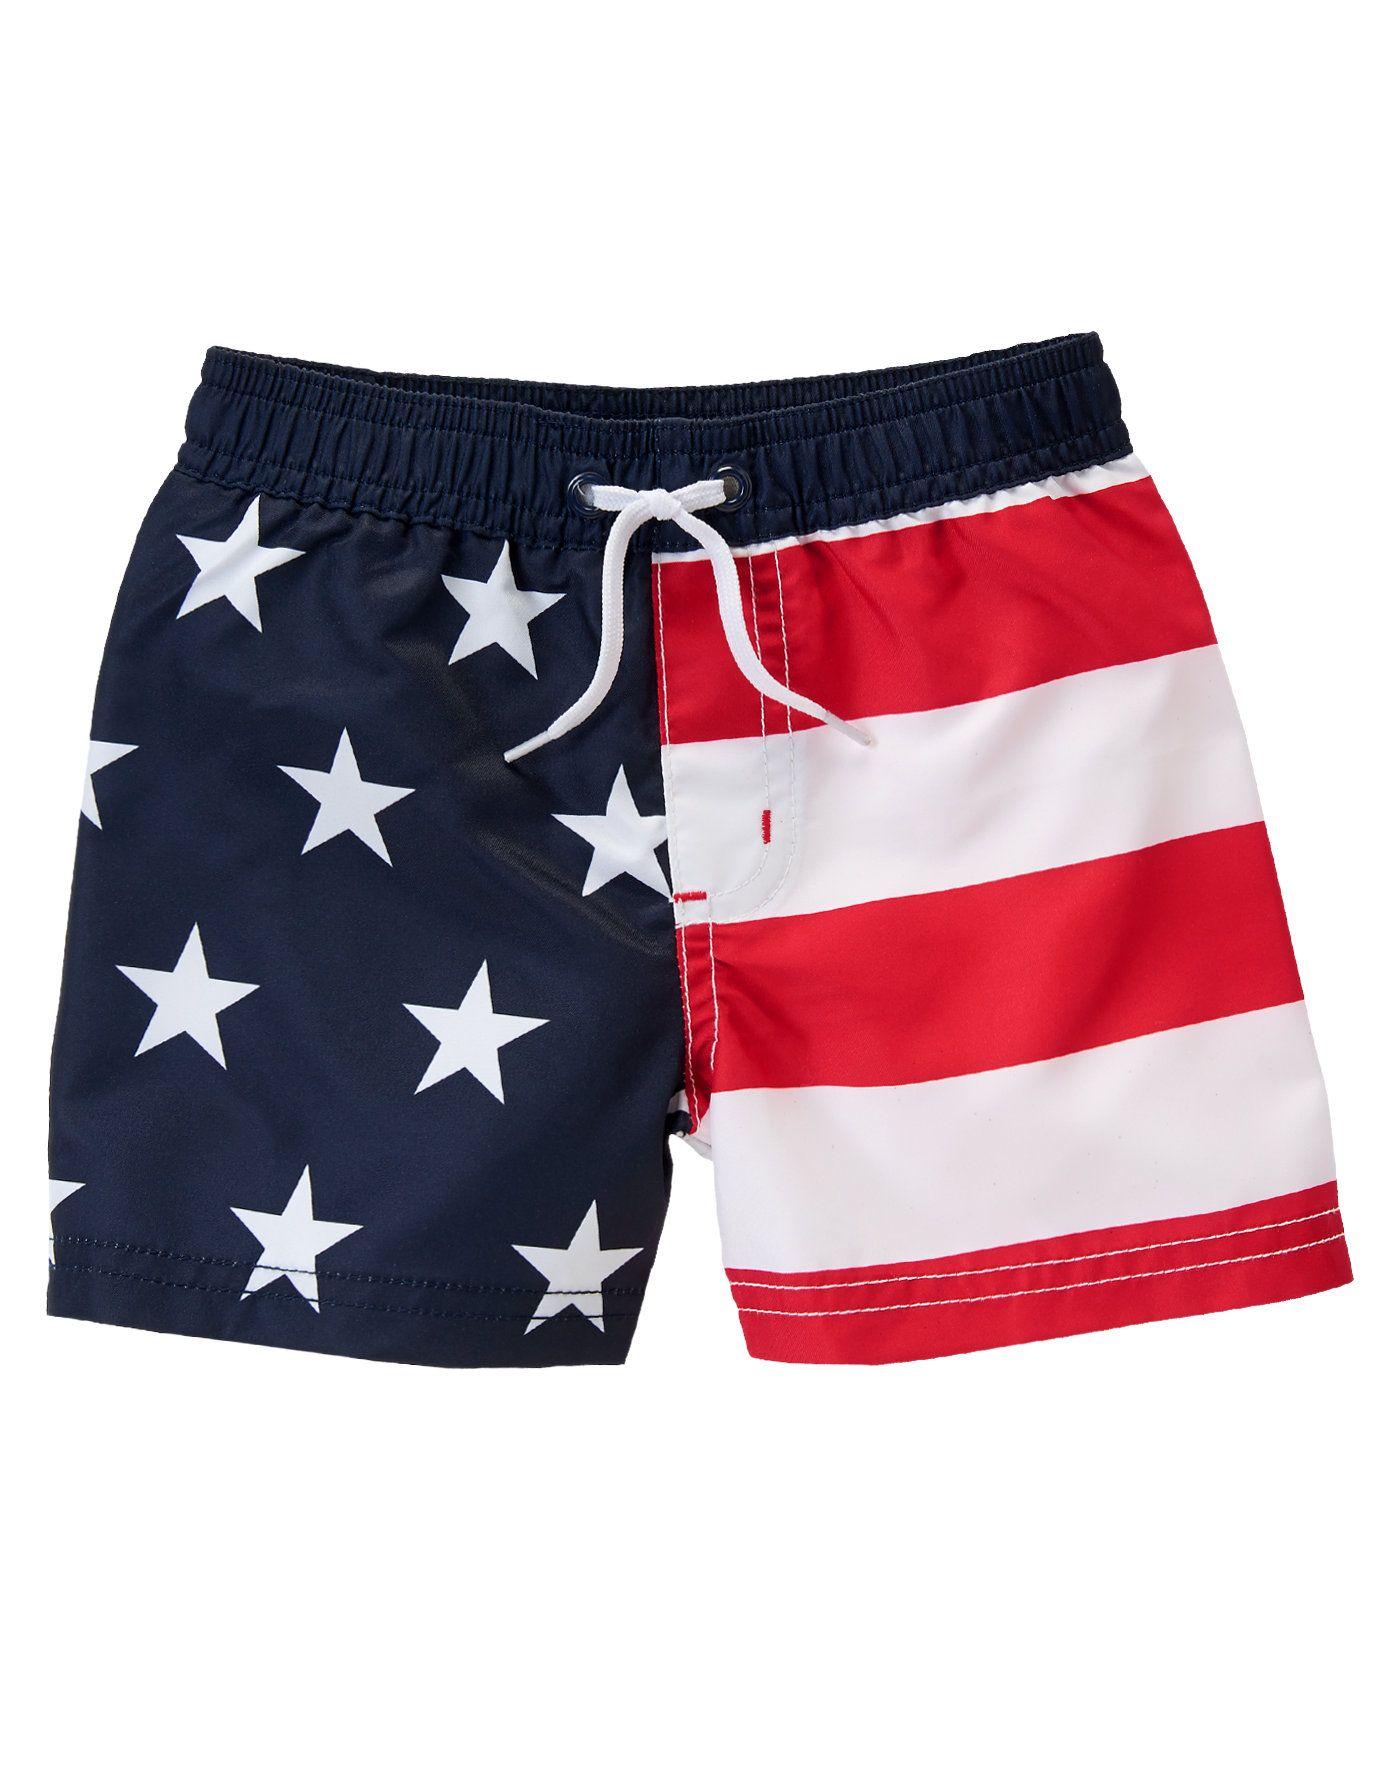 American Flag Swim Shorts Shorts Curtos Bermudas Shorts Roupas